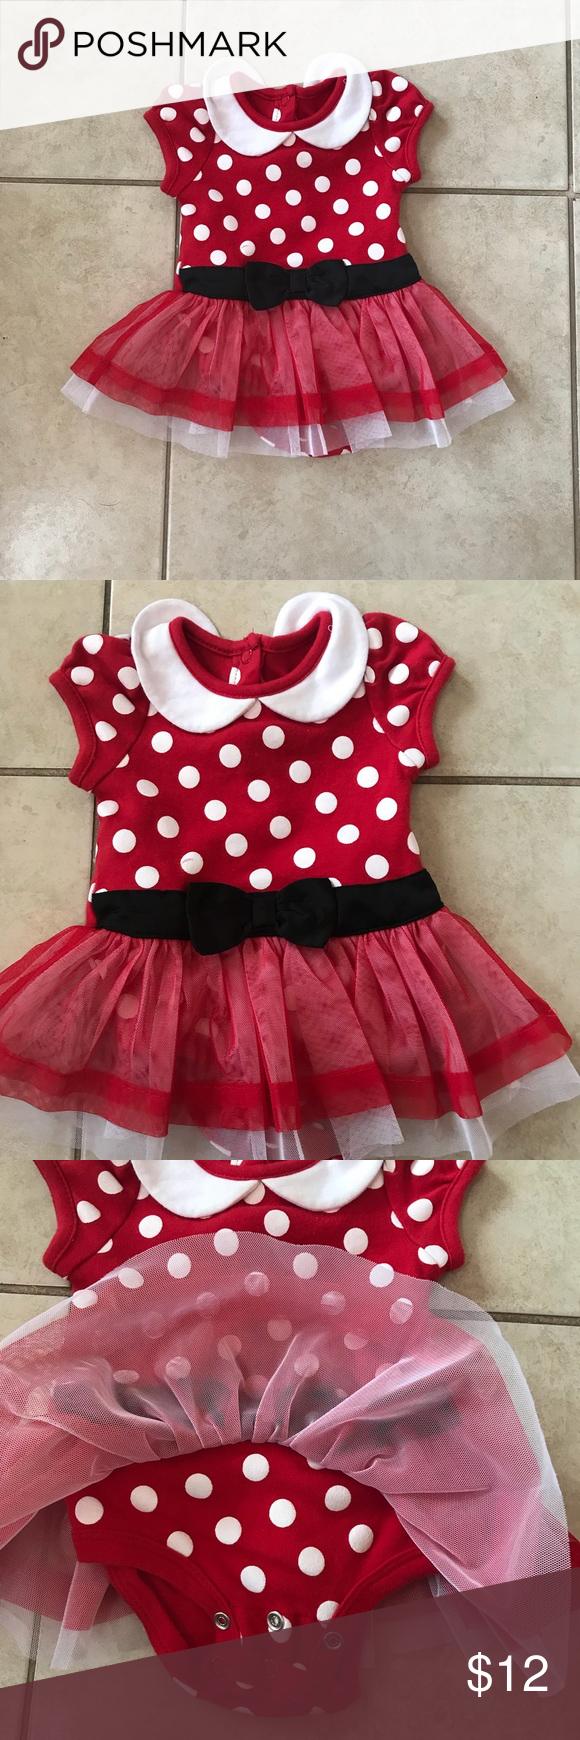 Minnie Mouse Onesie Dress Very cute Minnie Mouse Dress